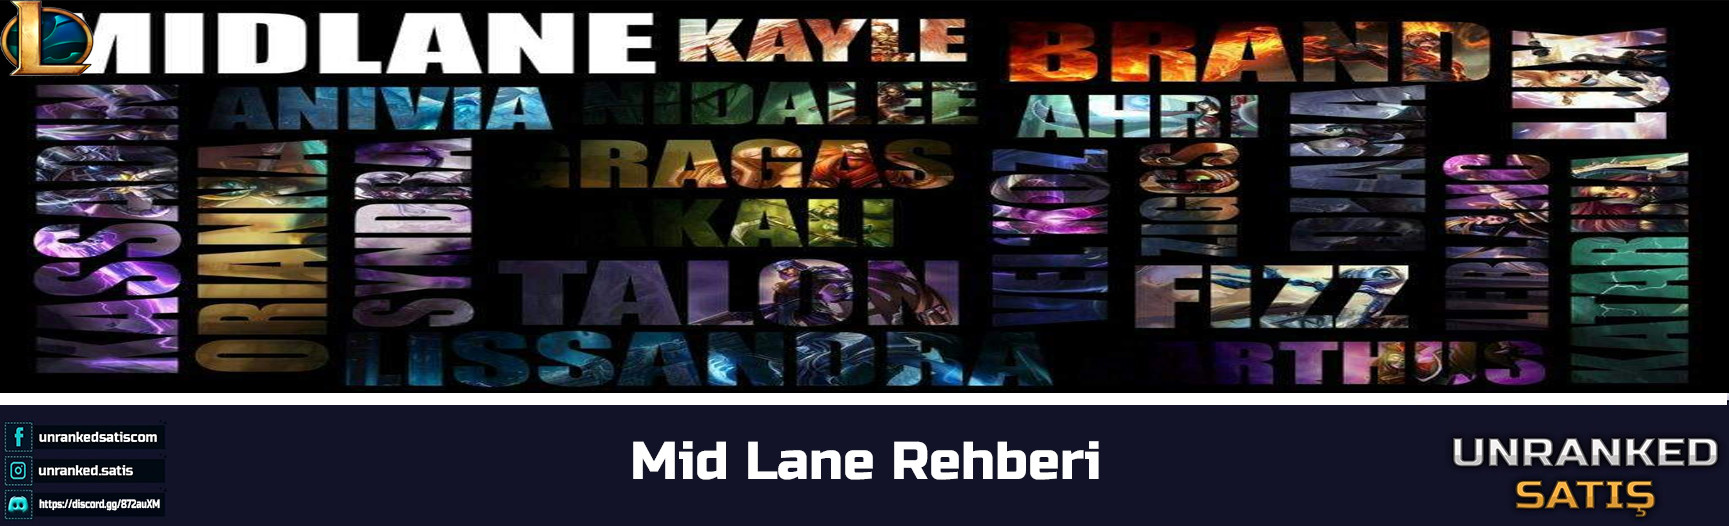 mid lane rehberi